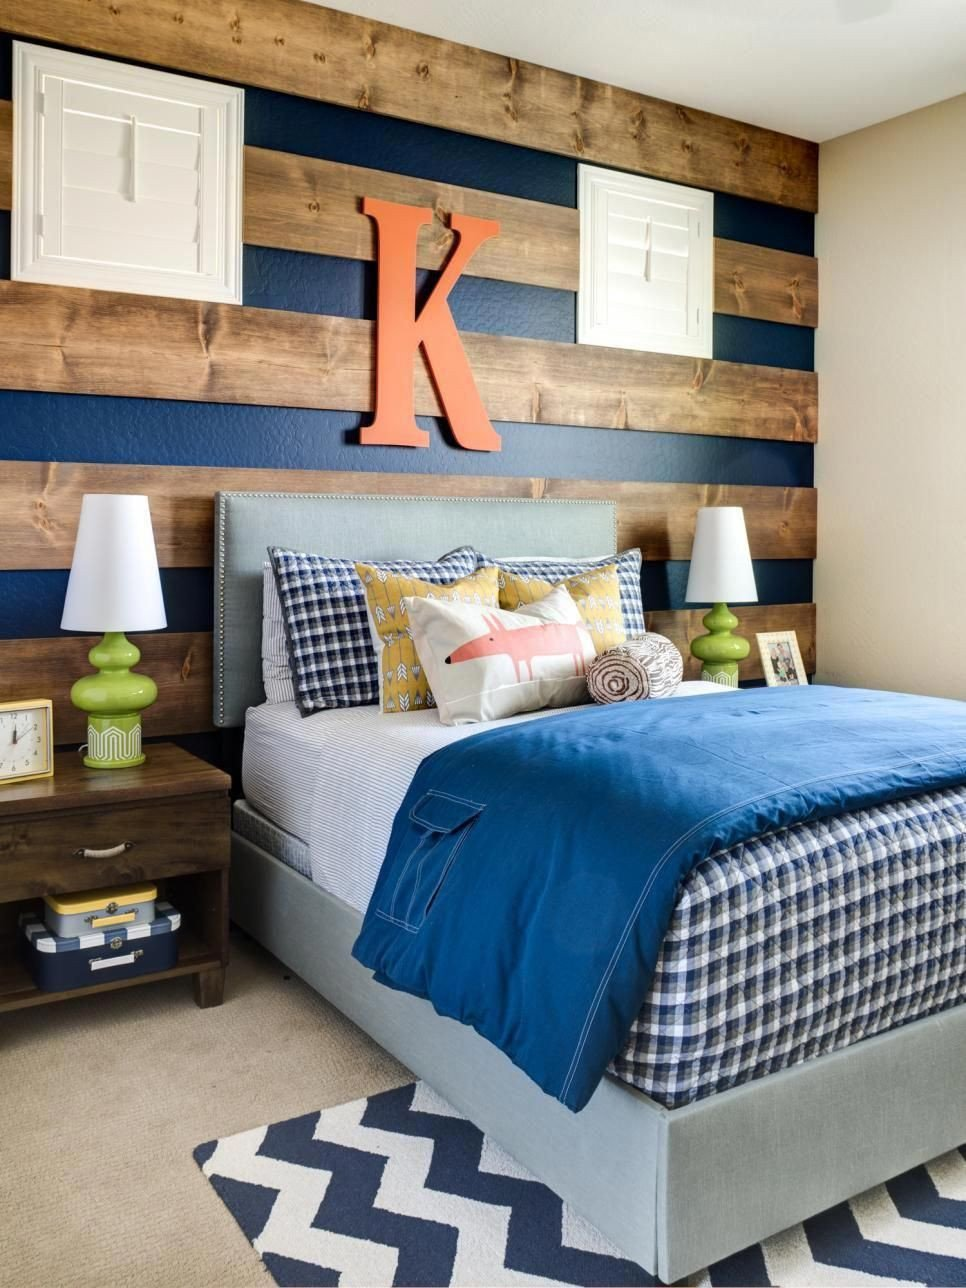 10 Year Old Boy Bedroom Ideas Luxury Pin by Elizabeth Bordelon On Home Sweet Home